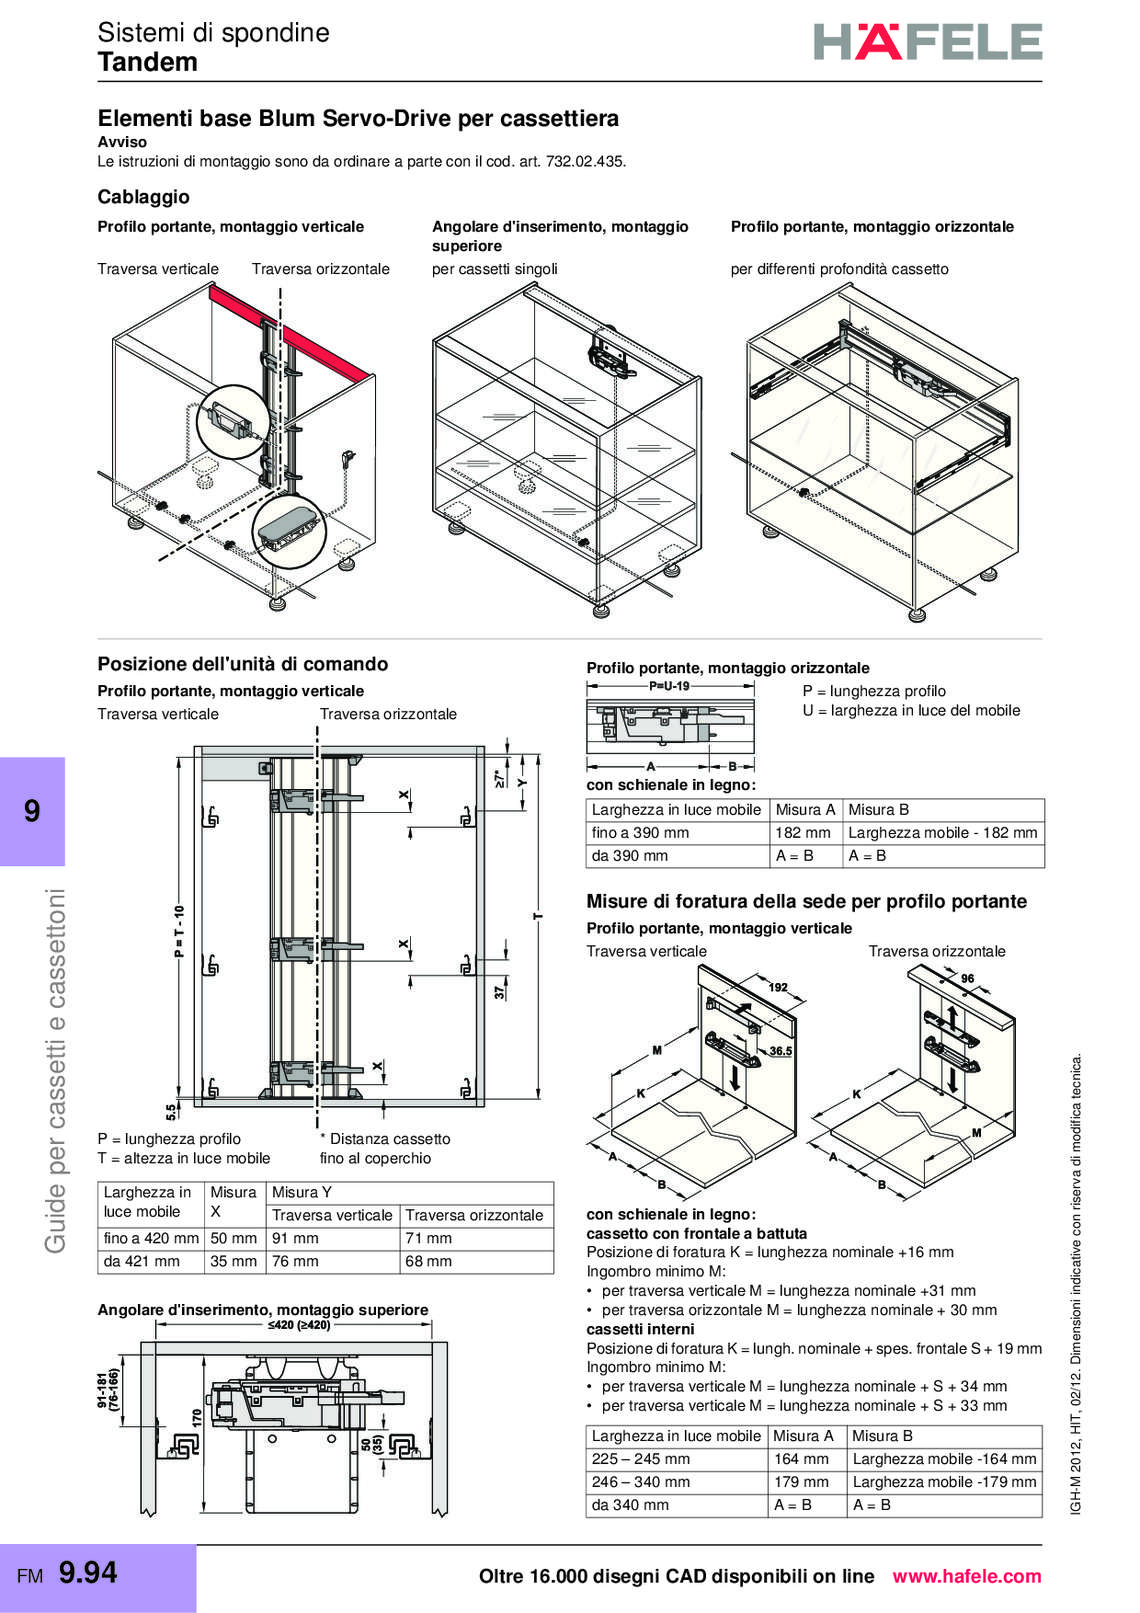 hafele-spondine-e-guide-per-mobili_40_117.jpg